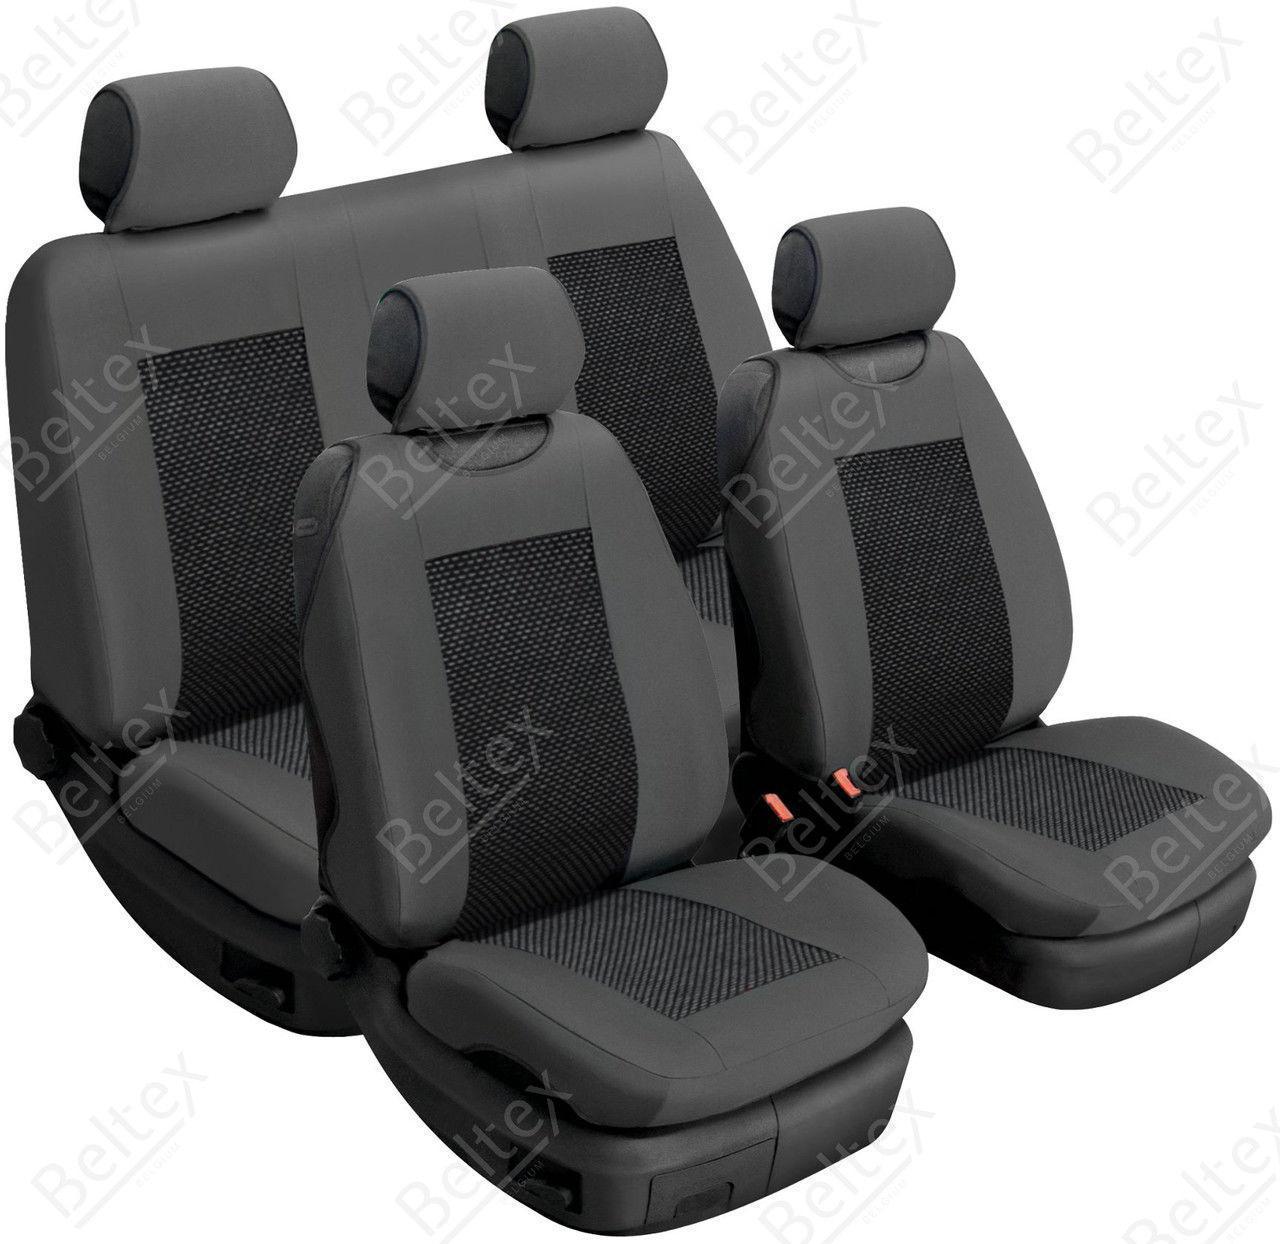 Майки/чехлы на сиденья Форд Фиеста МК4 (Ford Fiesta MK4)